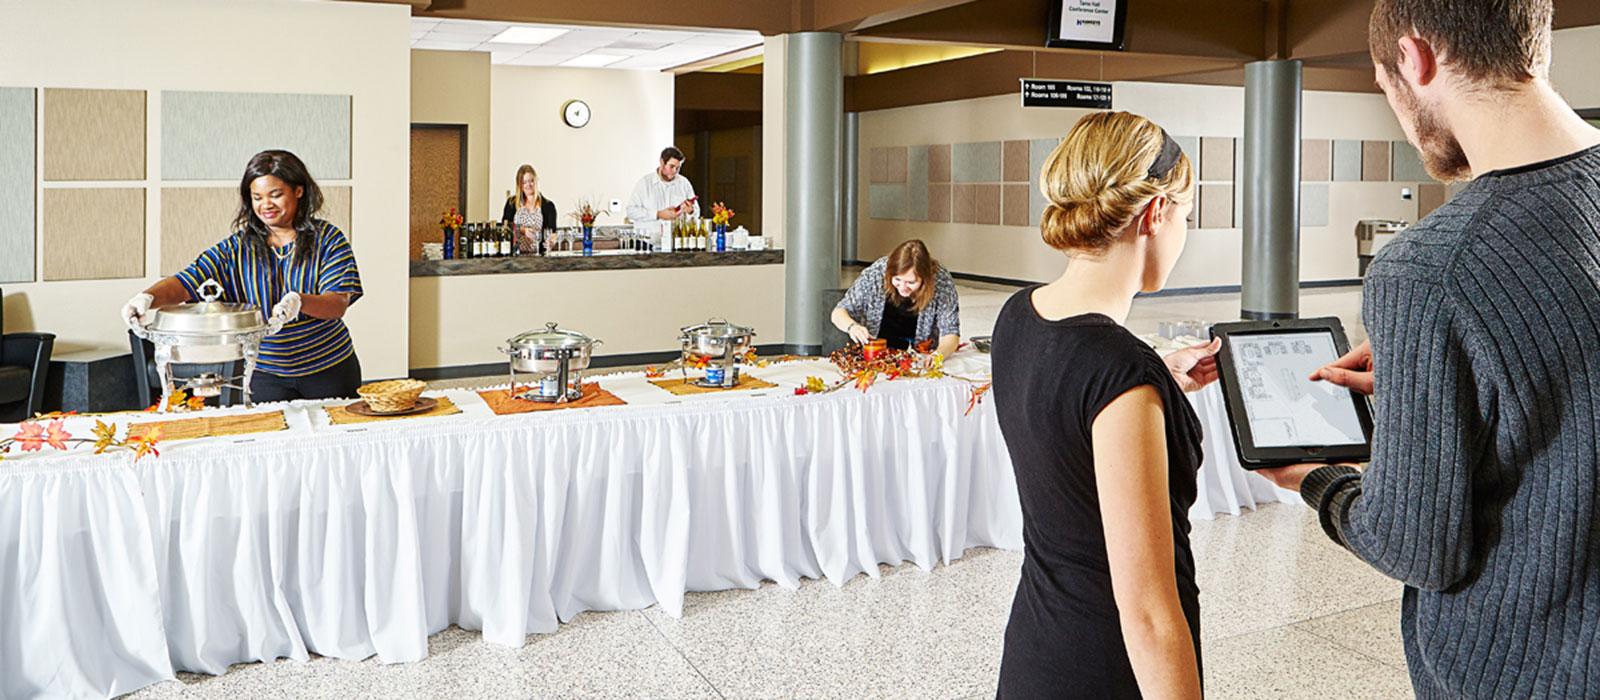 Hospitality Management - Hawkeye Community College